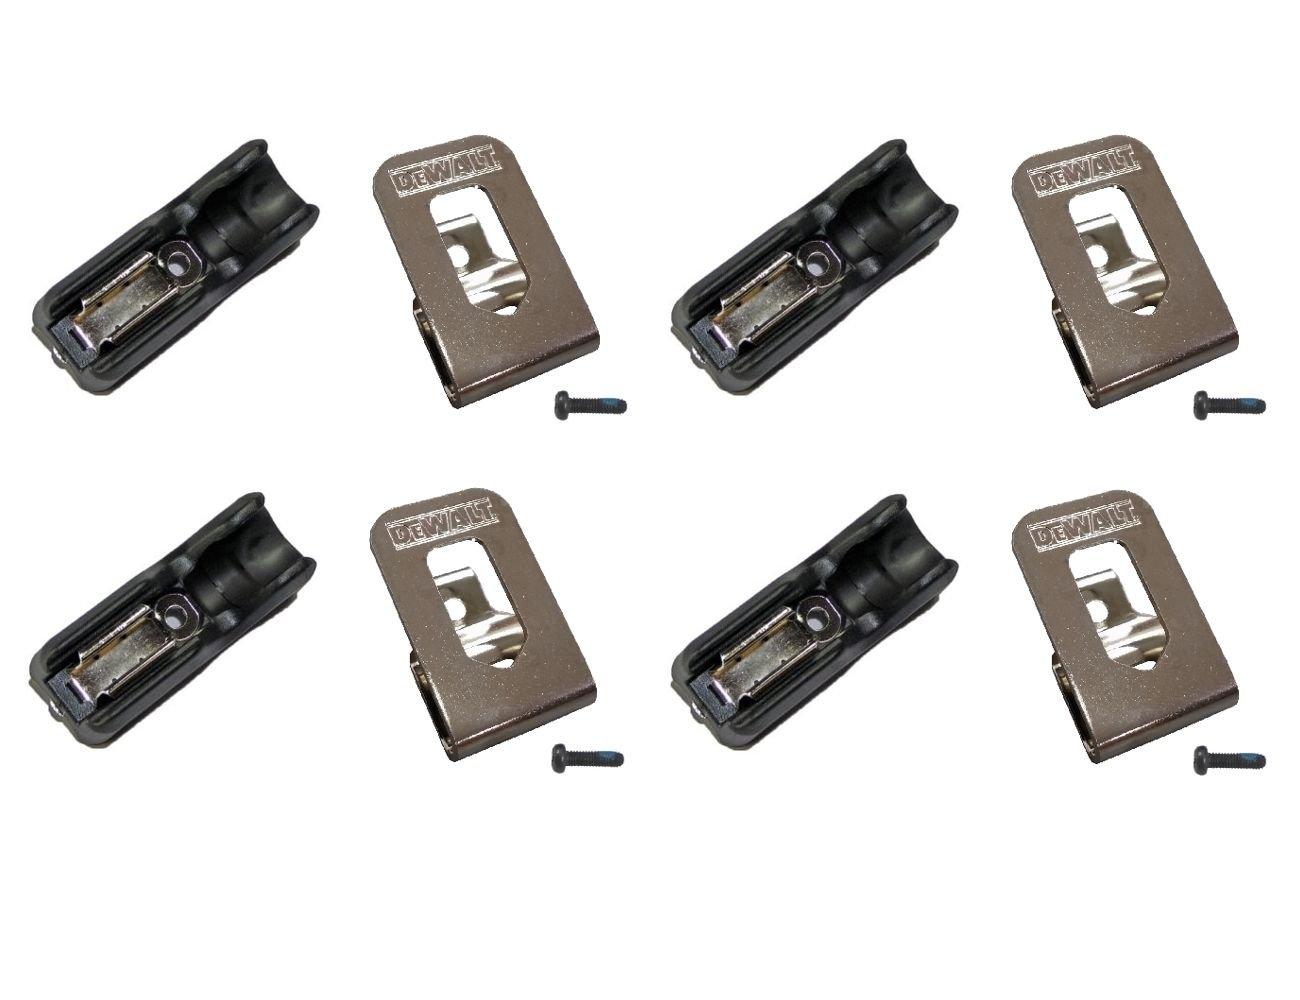 8 Pc. DeWalt Belt Hook & Bit Clip Holder Combo 20v Max DCD771 DCD980 DCD985